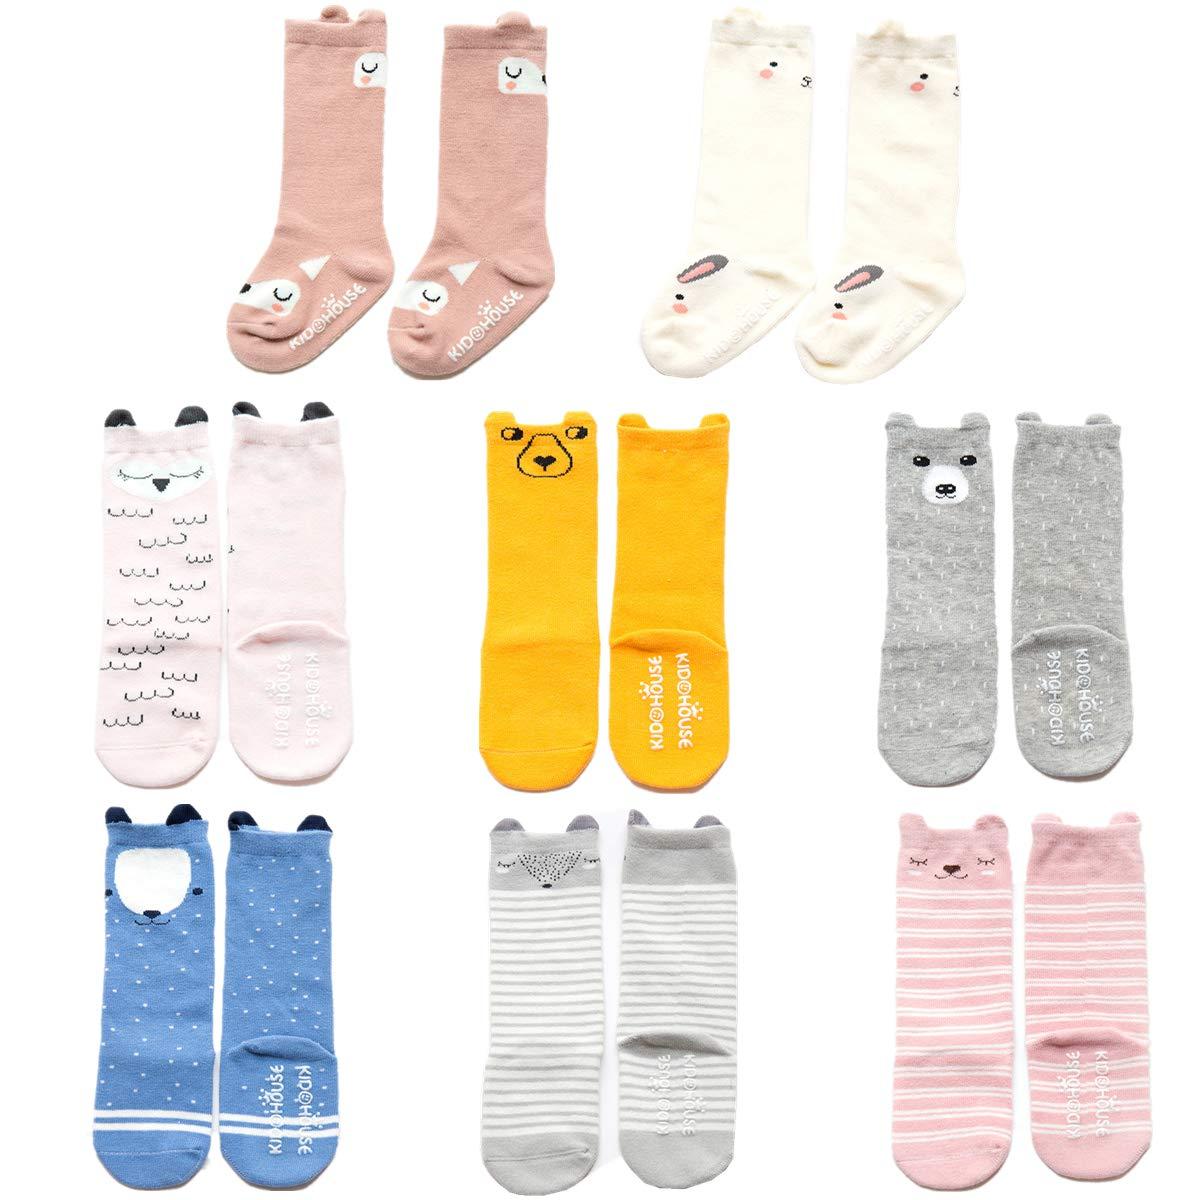 Fasker 6 Pairs Unisex Baby Girls Socks Knee High Socks Animal Baby Stockings